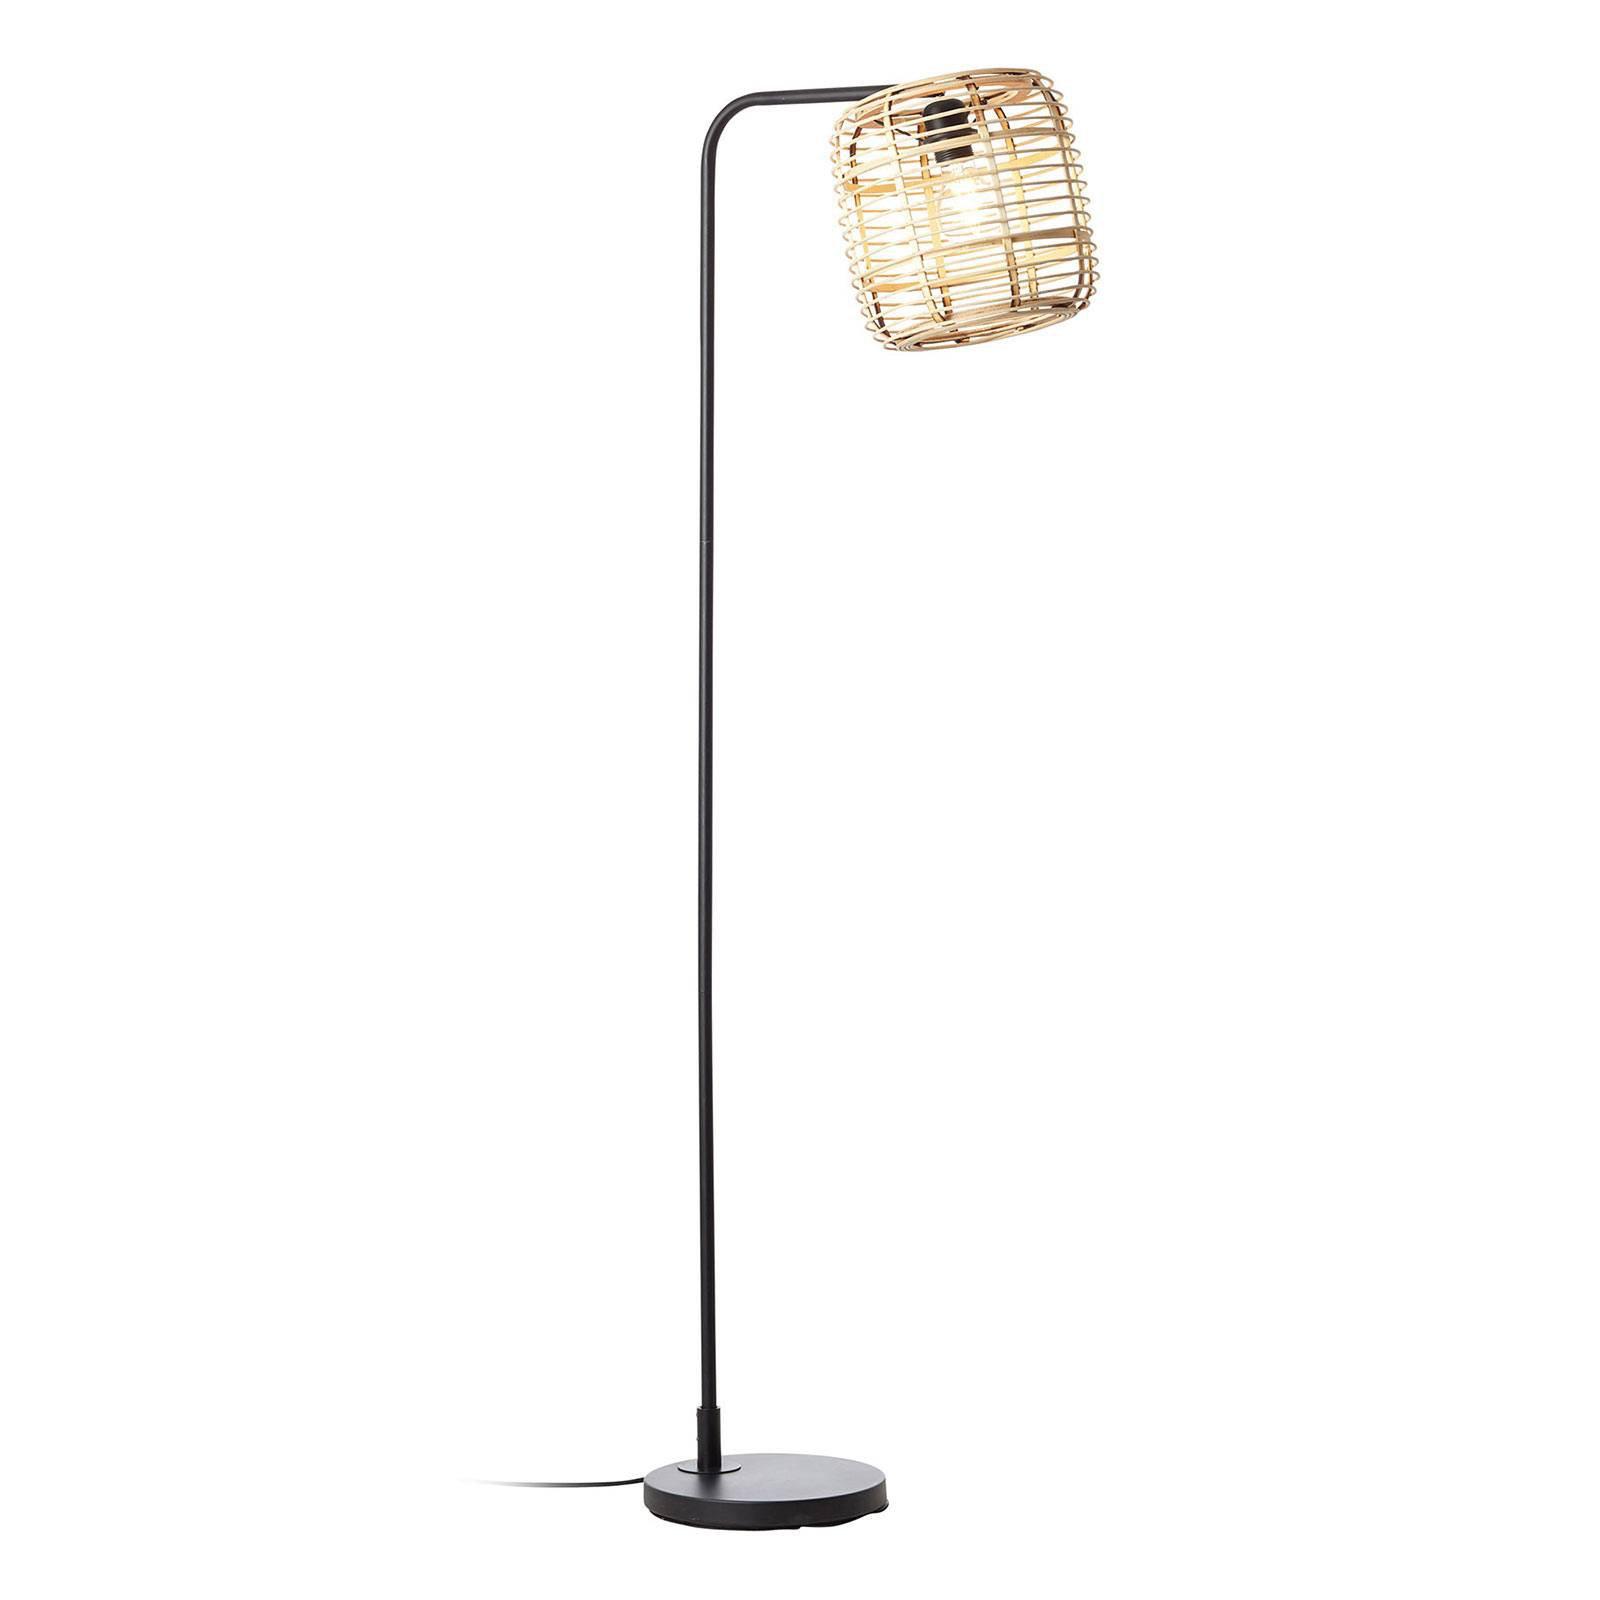 Gulvlampe Crosstown svart, bambusskjerm lys